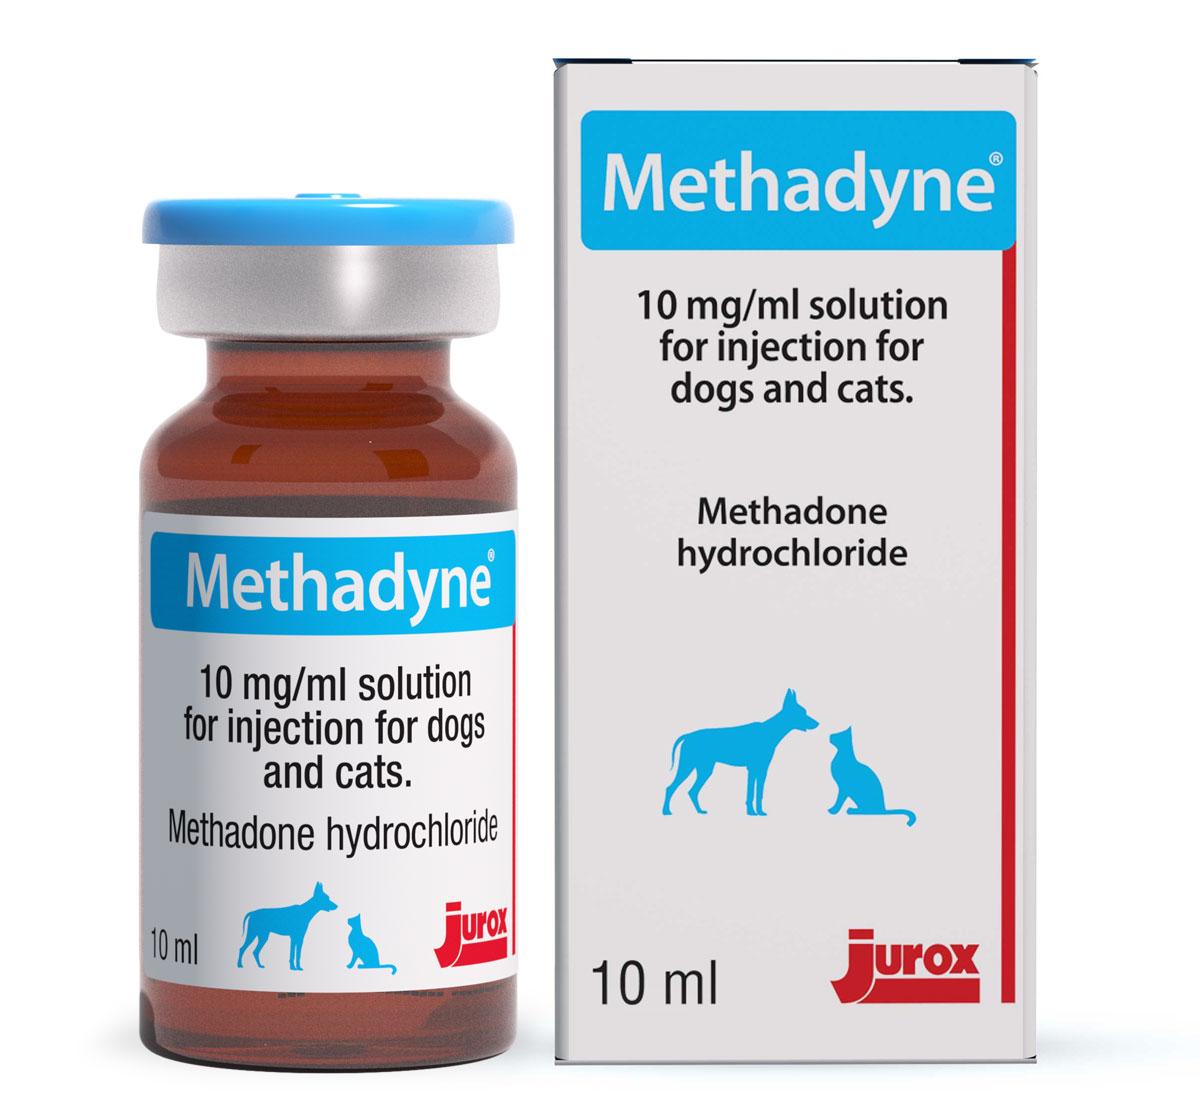 Methadyne